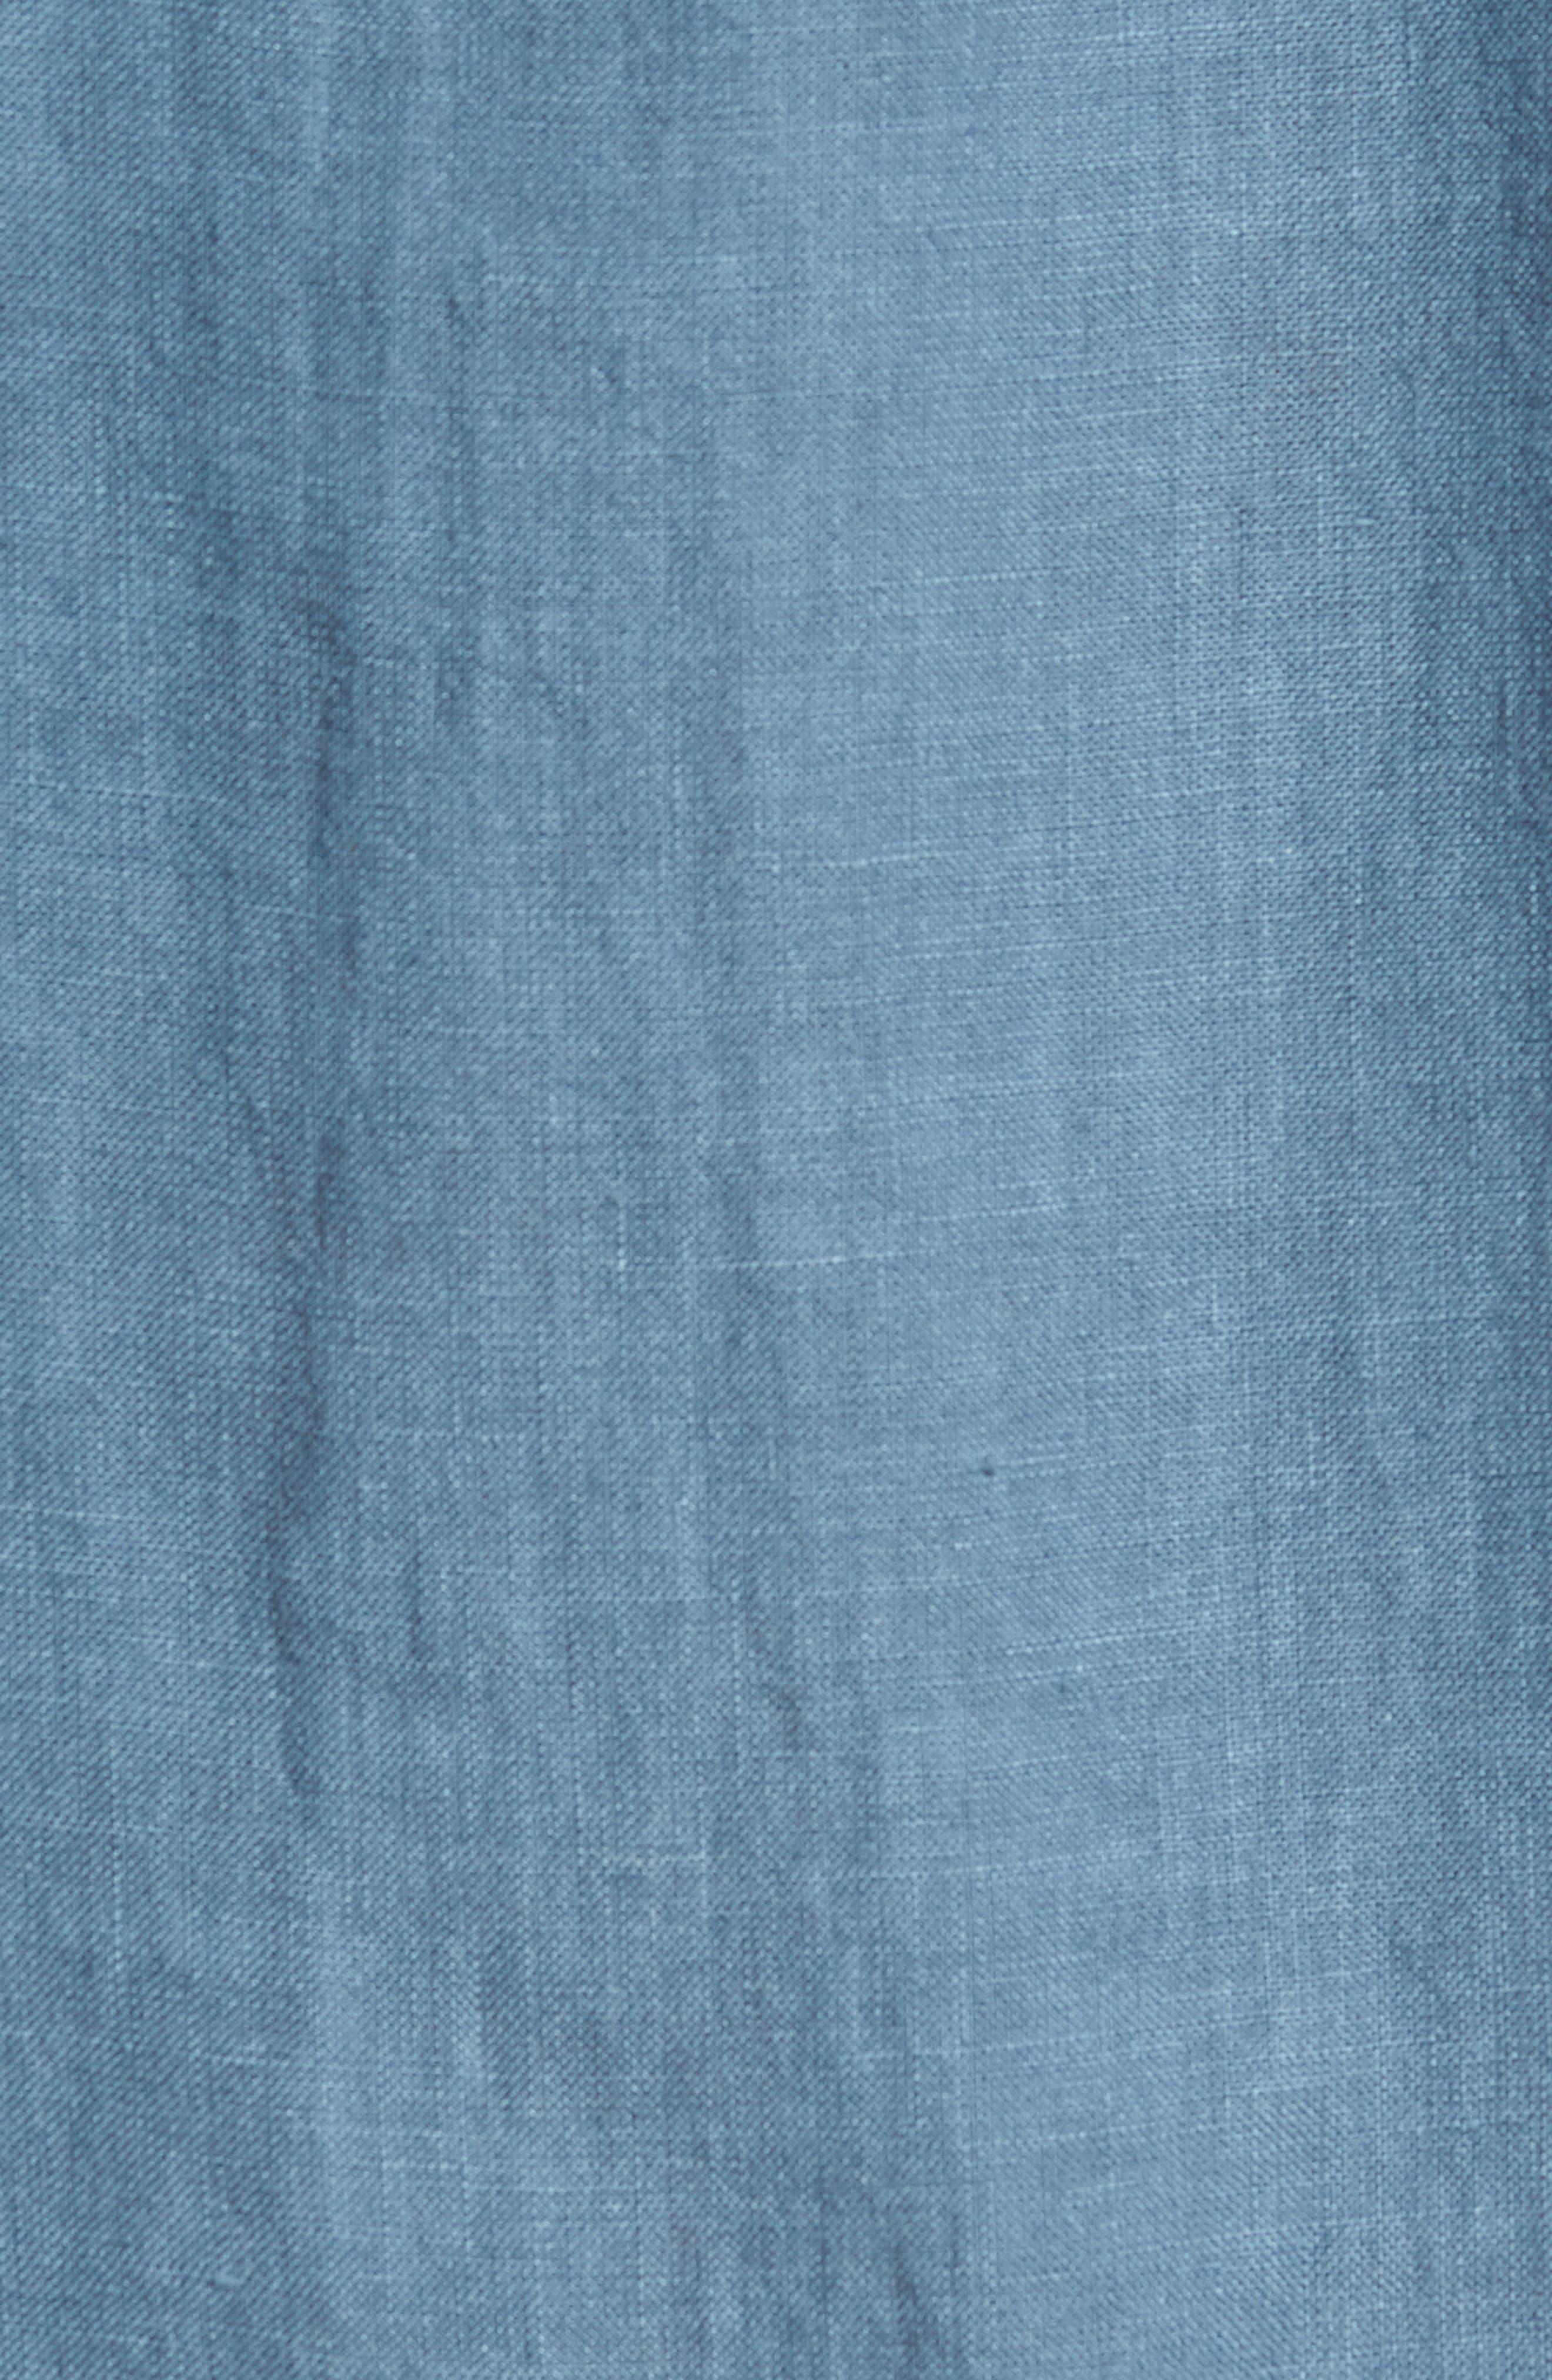 Irving Trim Fit Linen Short Sleeve Sport Shirt,                             Alternate thumbnail 5, color,                             Hydro